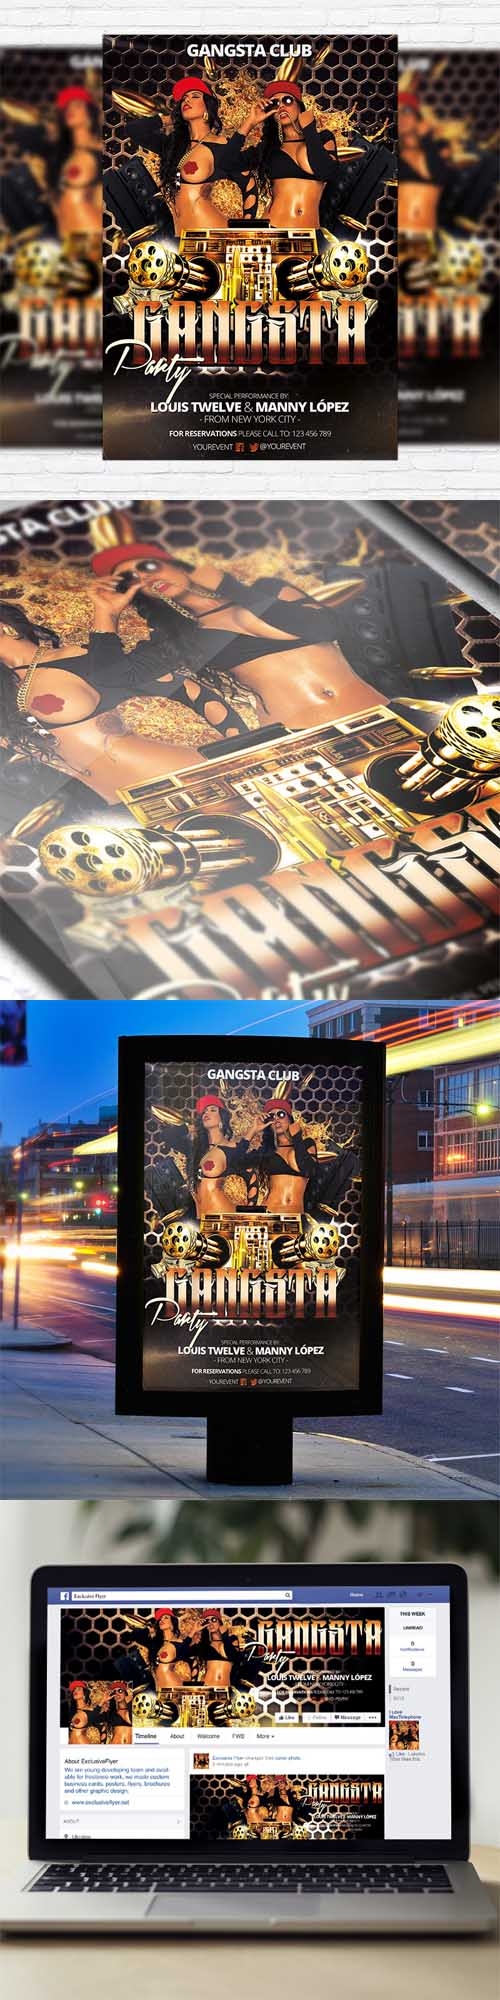 Flyer Template - Gangsta Party + Facebook Cover